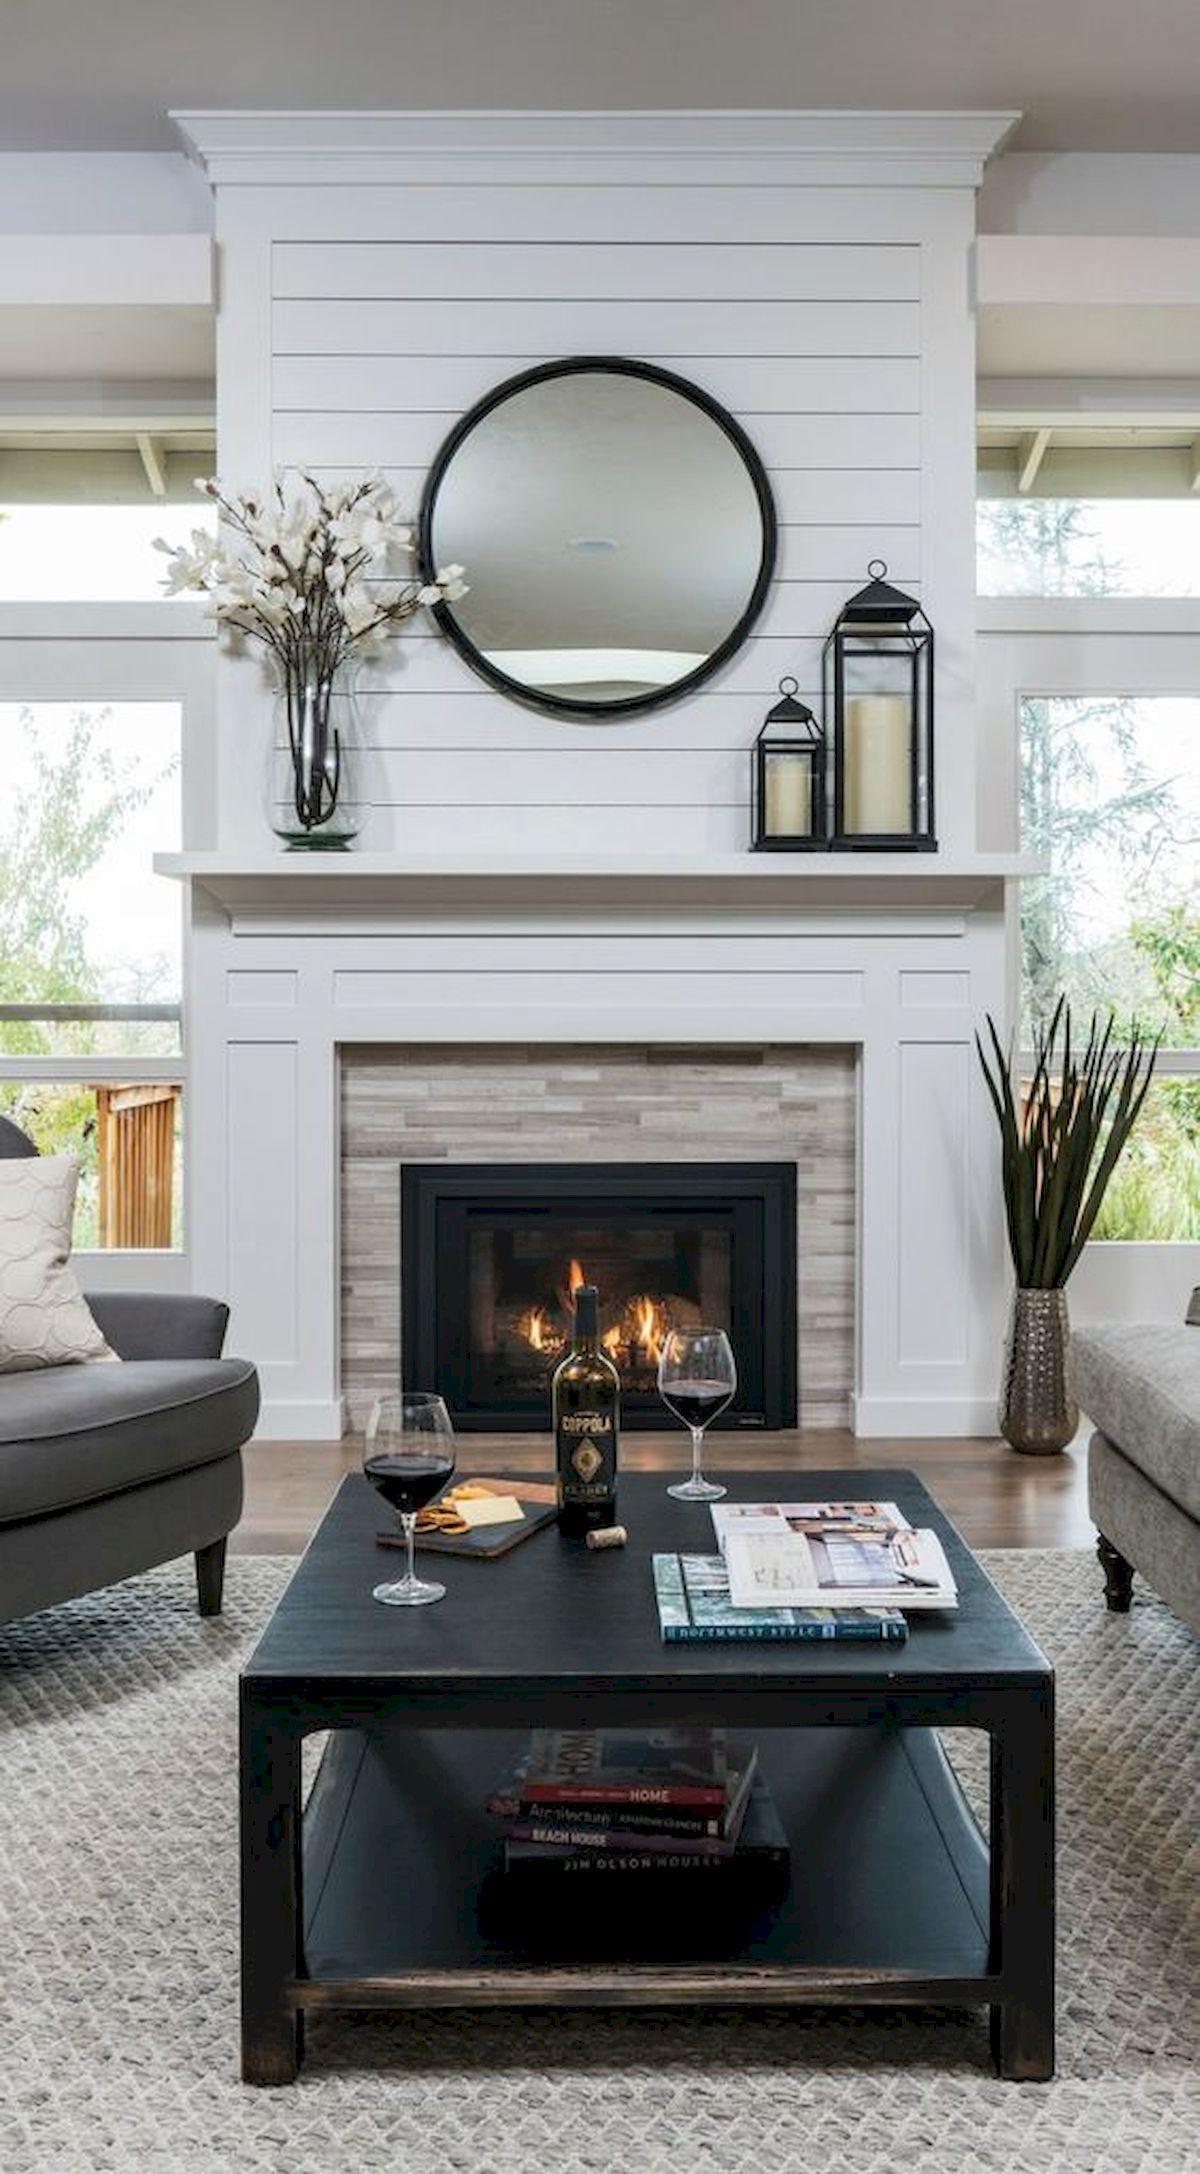 33 Gorgeous Farmhouse Fireplace Decor Ideas And Design Our Next House Farmhouse Fireplace